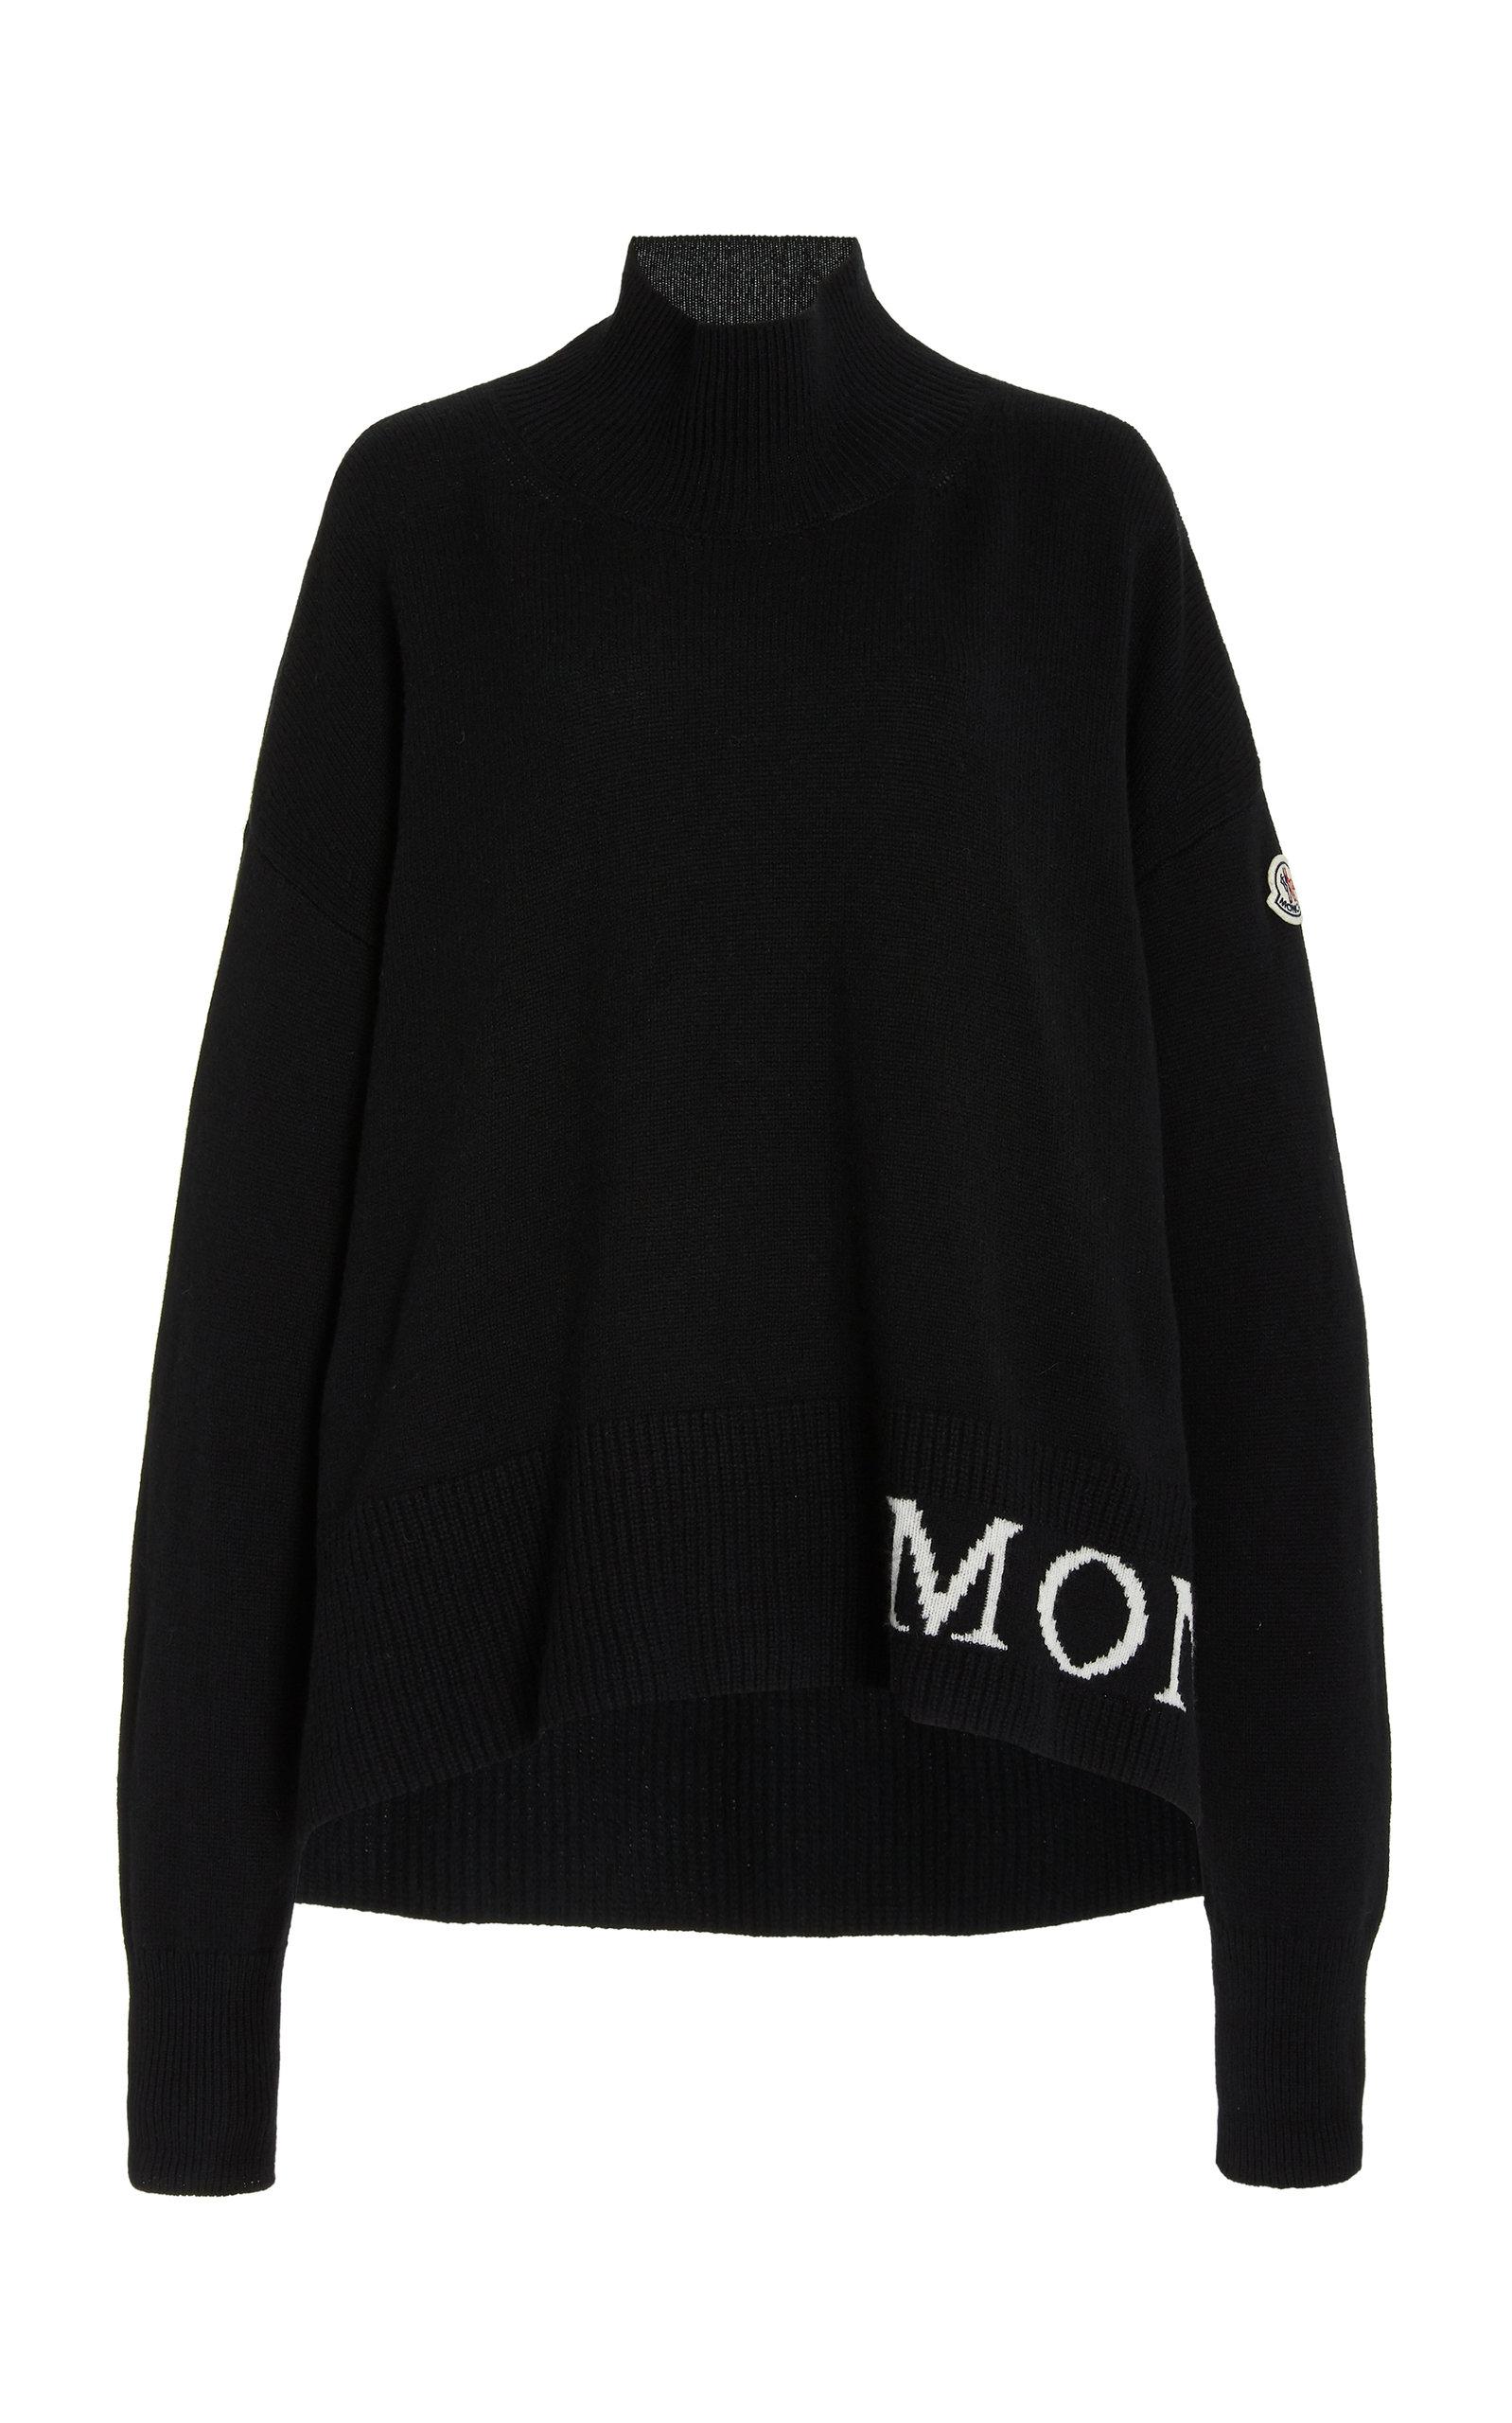 Moncler - Women's Logo-Knit Wool-Cashmere Oversized Sweater - Black - Moda Operandi